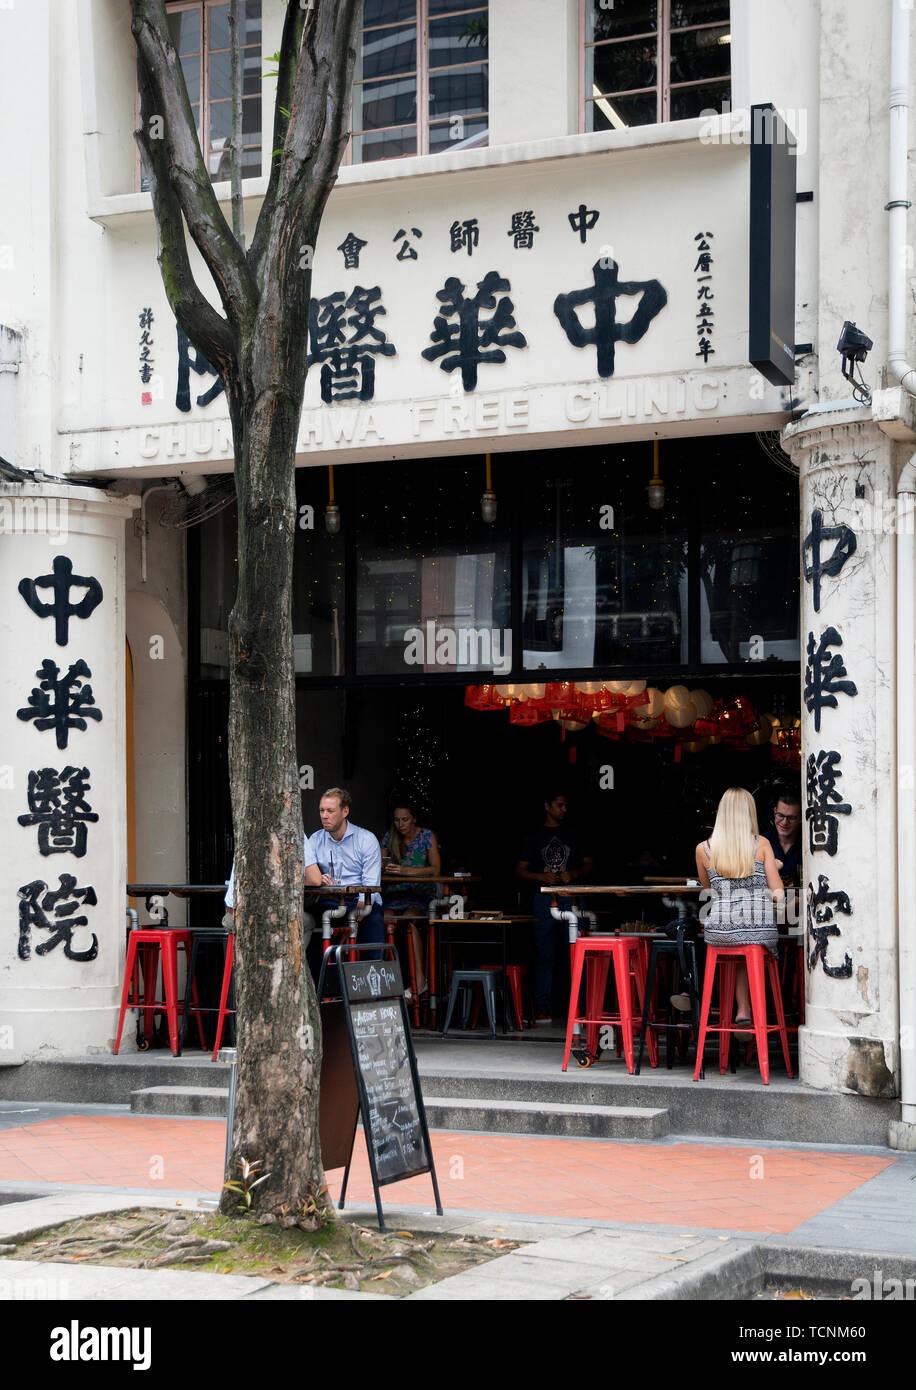 singapore - 2017.02.09: people enjoying their lunch at a restaurant on  telok ayer street - Stock Image